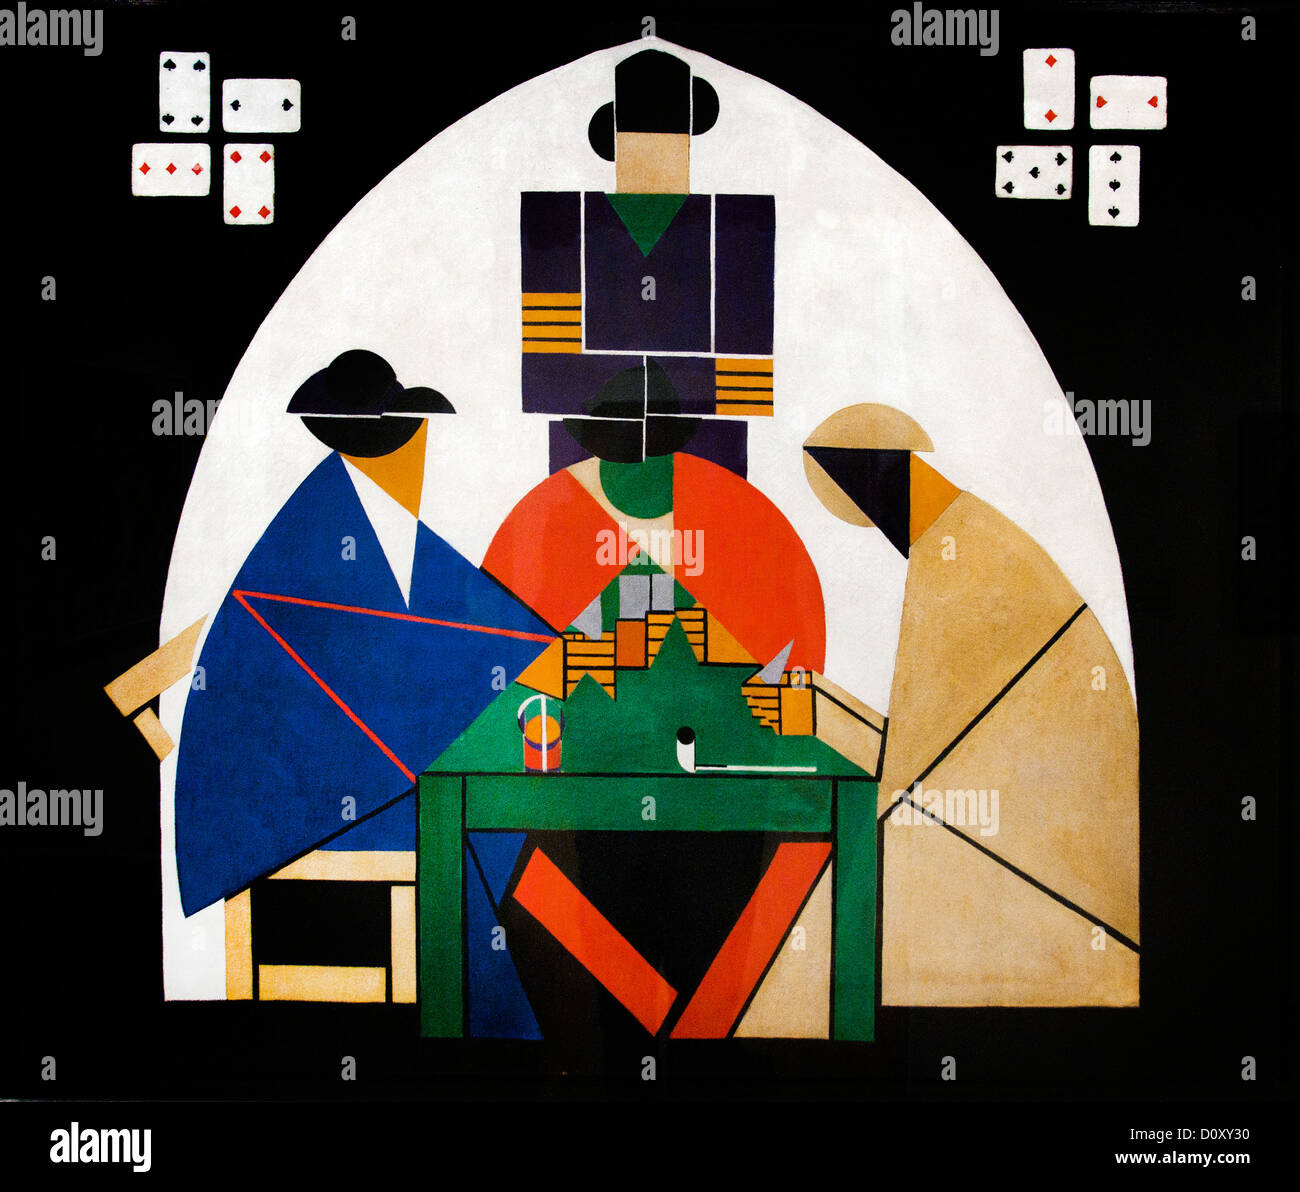 Die Karte Spieler 1916 Theo van Doesburg, Niederlande Niederlande Stockbild